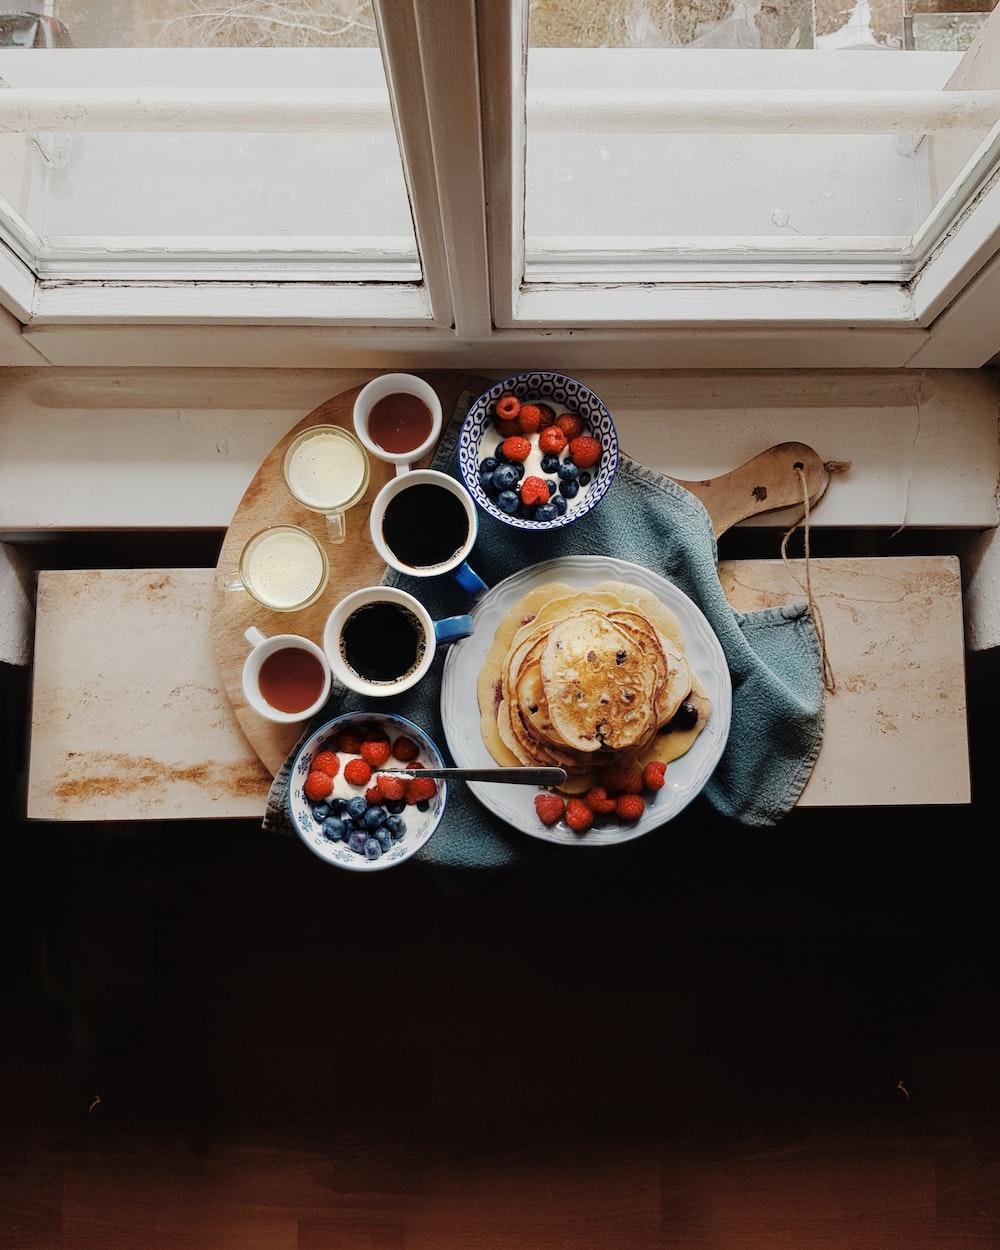 flatbread served on white plate